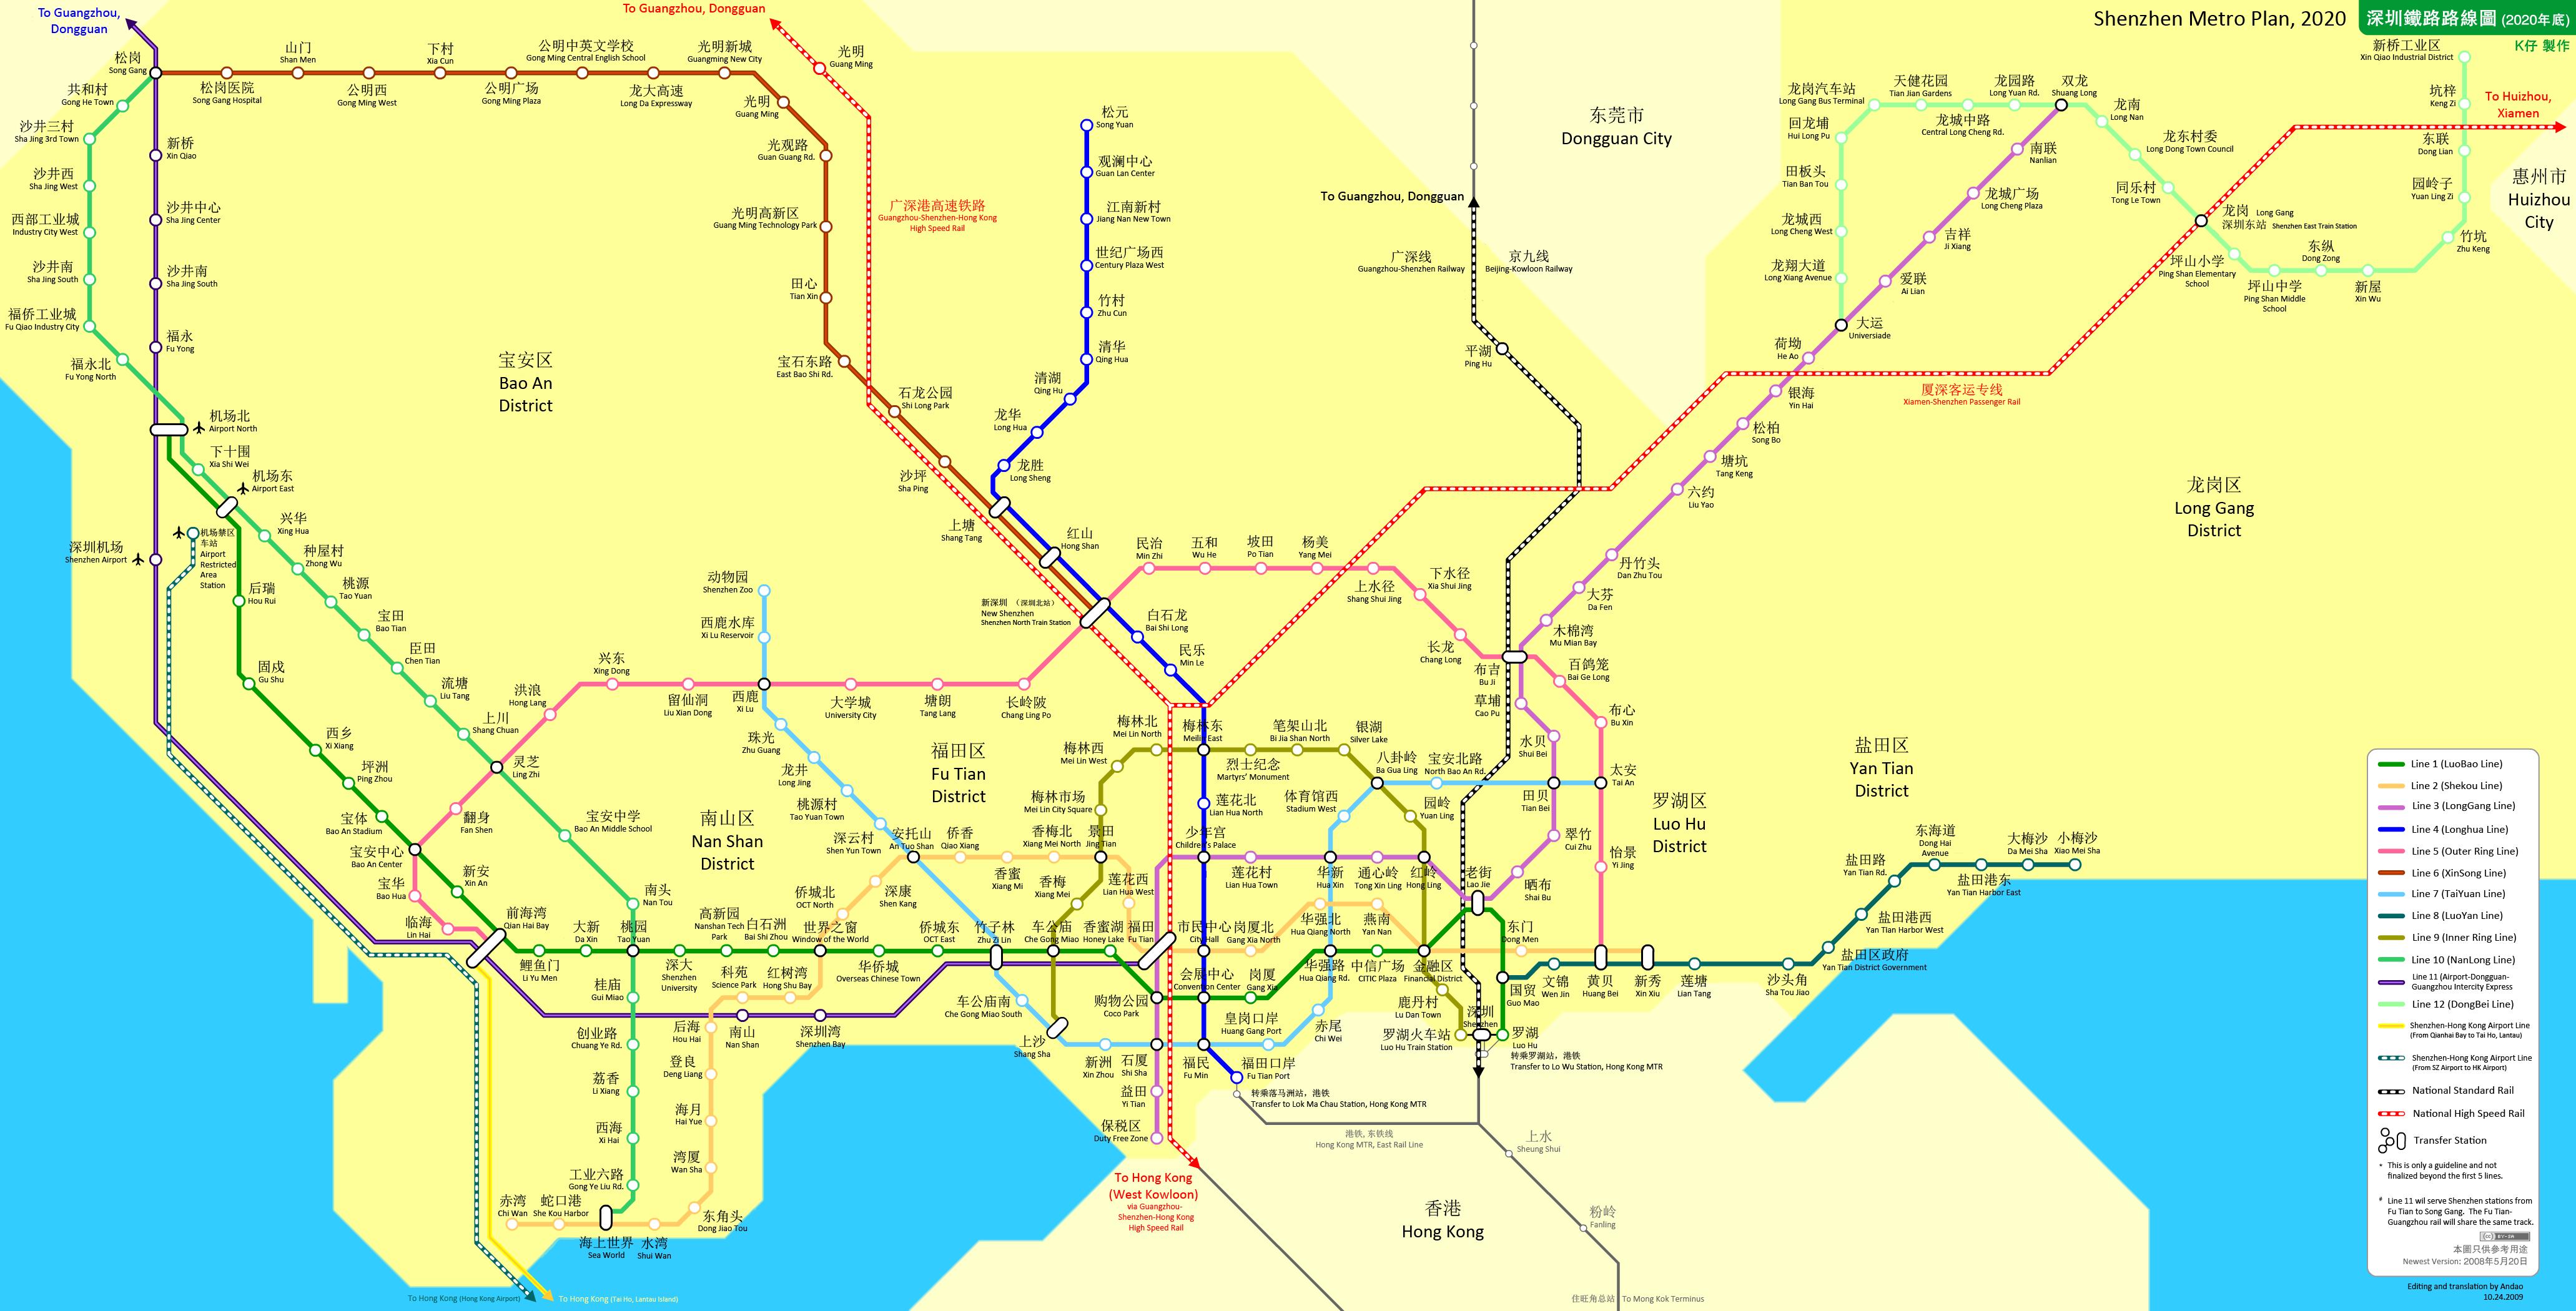 sz_railway_2020_english.png